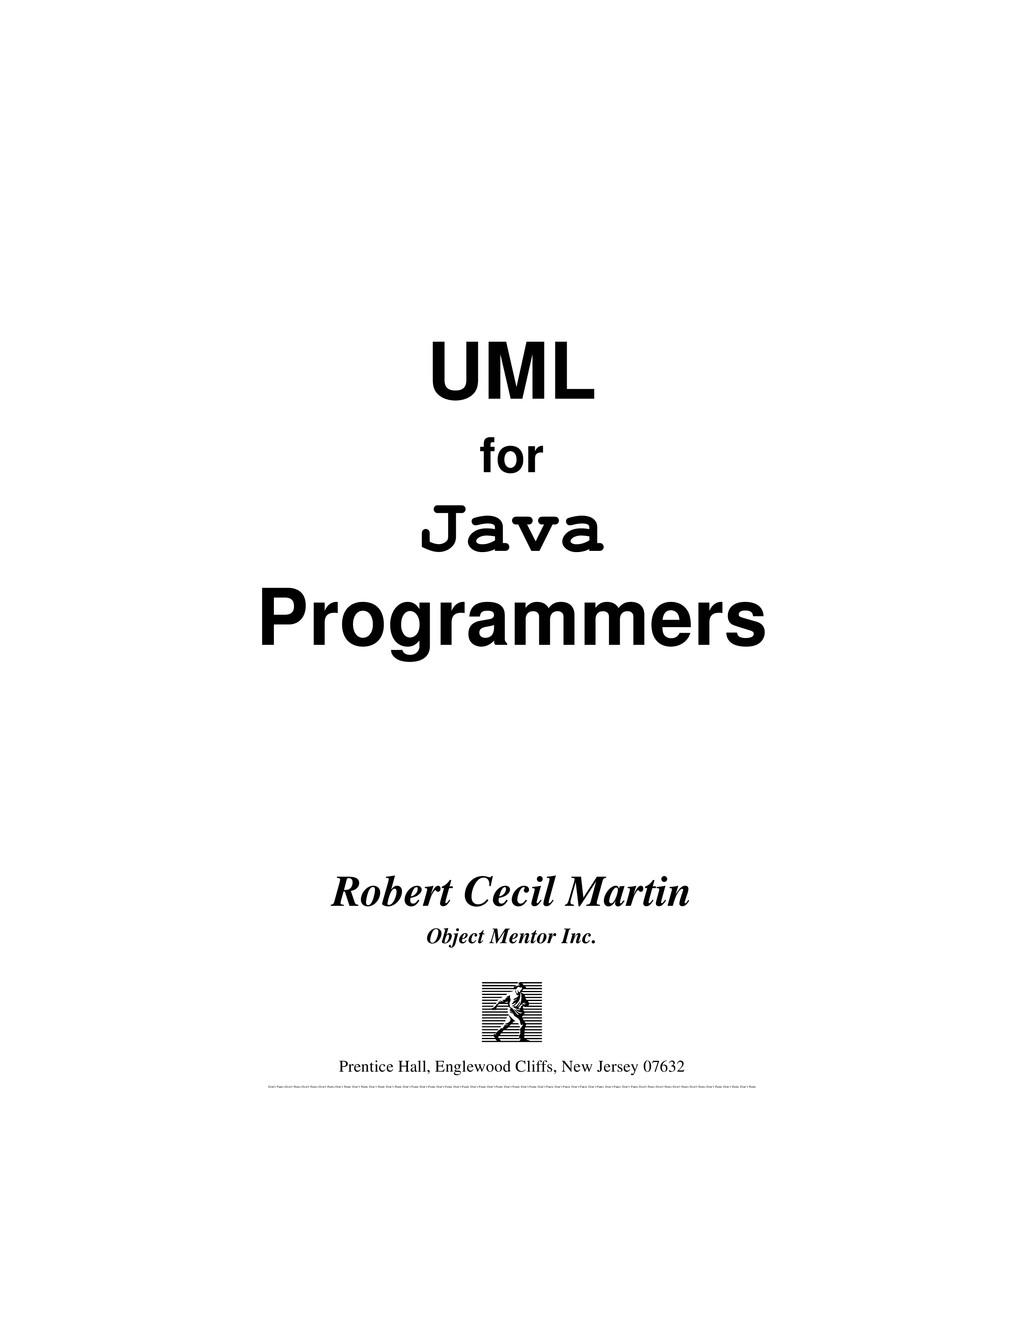 UML for Java Programmers Robert Cecil Martin Ob...